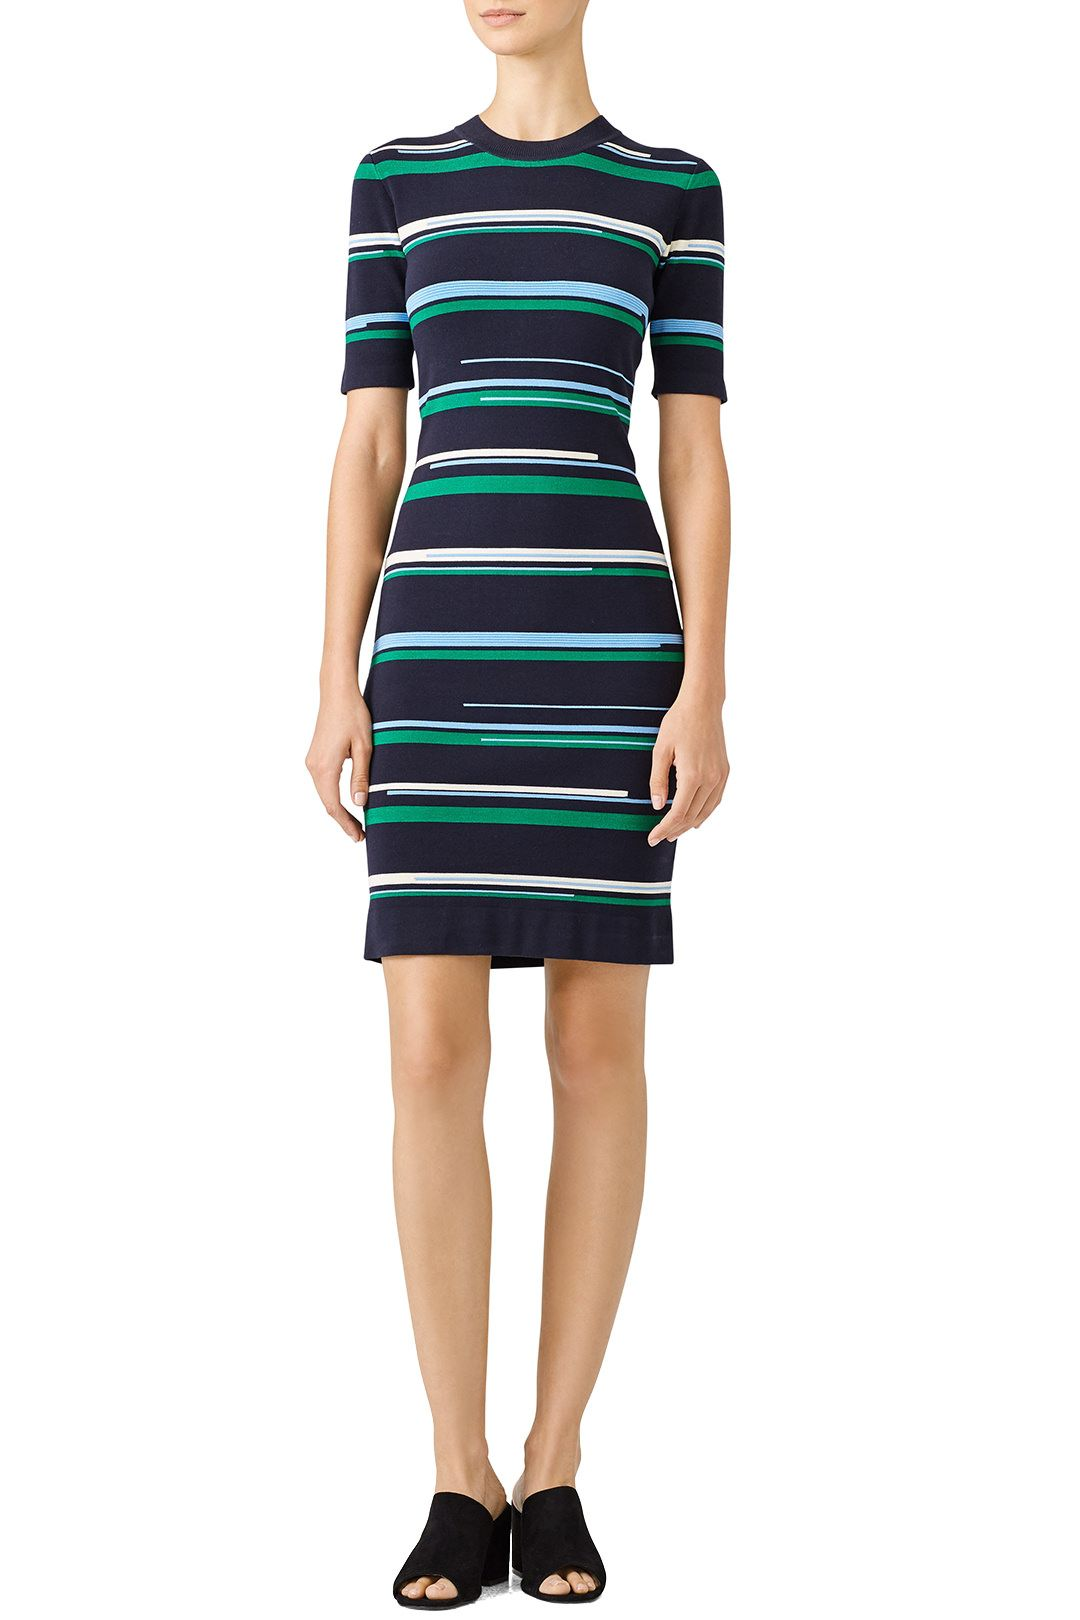 Stripe Knit Dress In 2021 Striped Knit Dress Knit Dress Striped Knit [ 1500 x 1000 Pixel ]